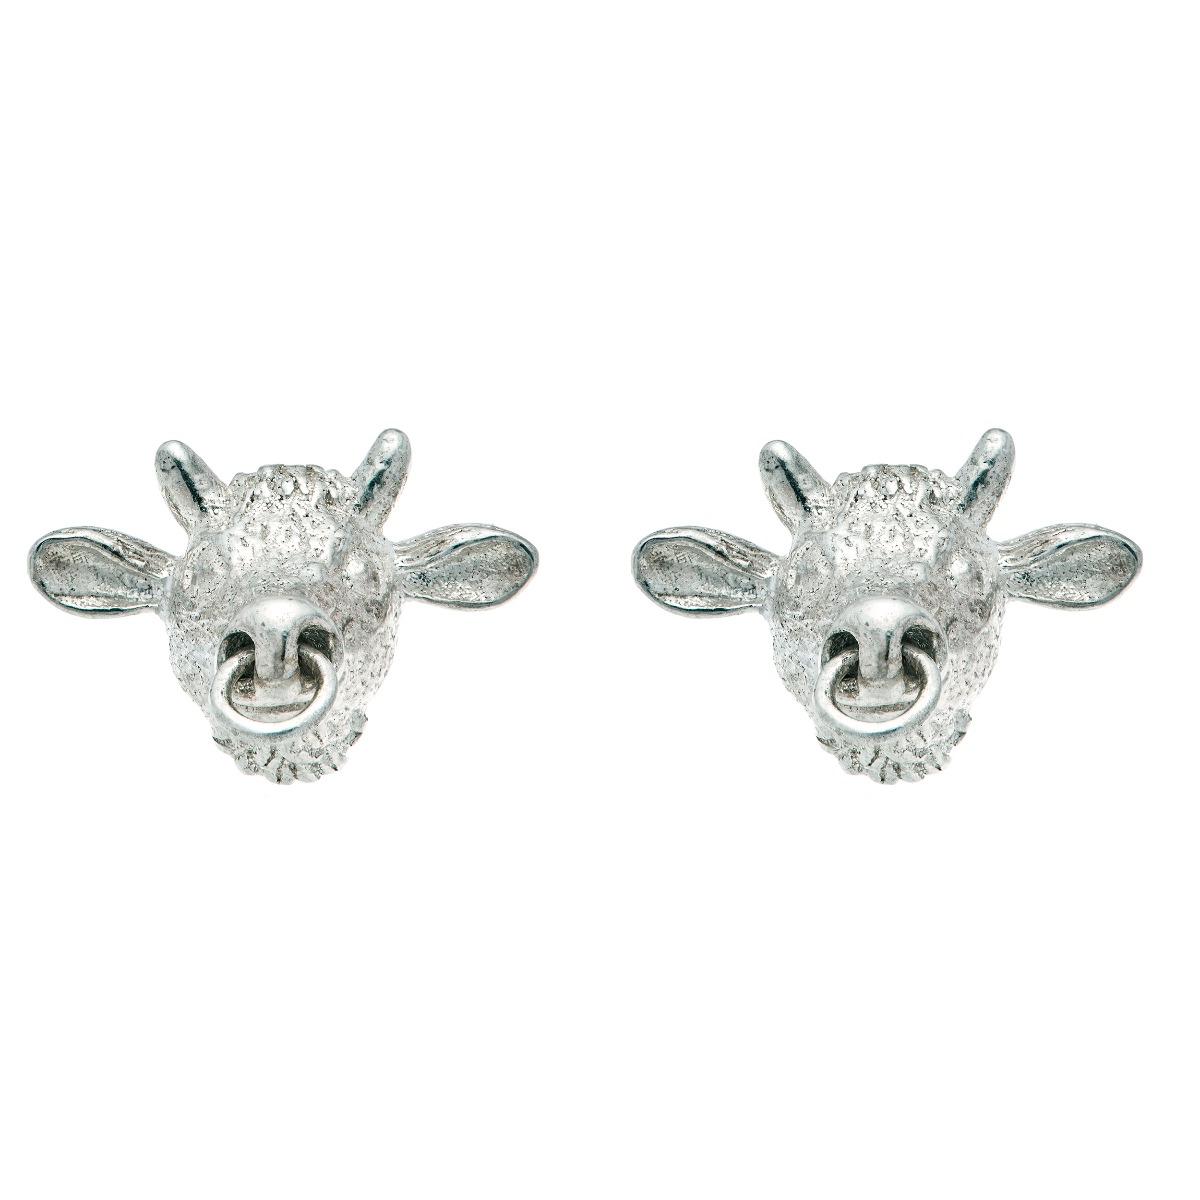 Chinese zodiac stud earrings (ox)